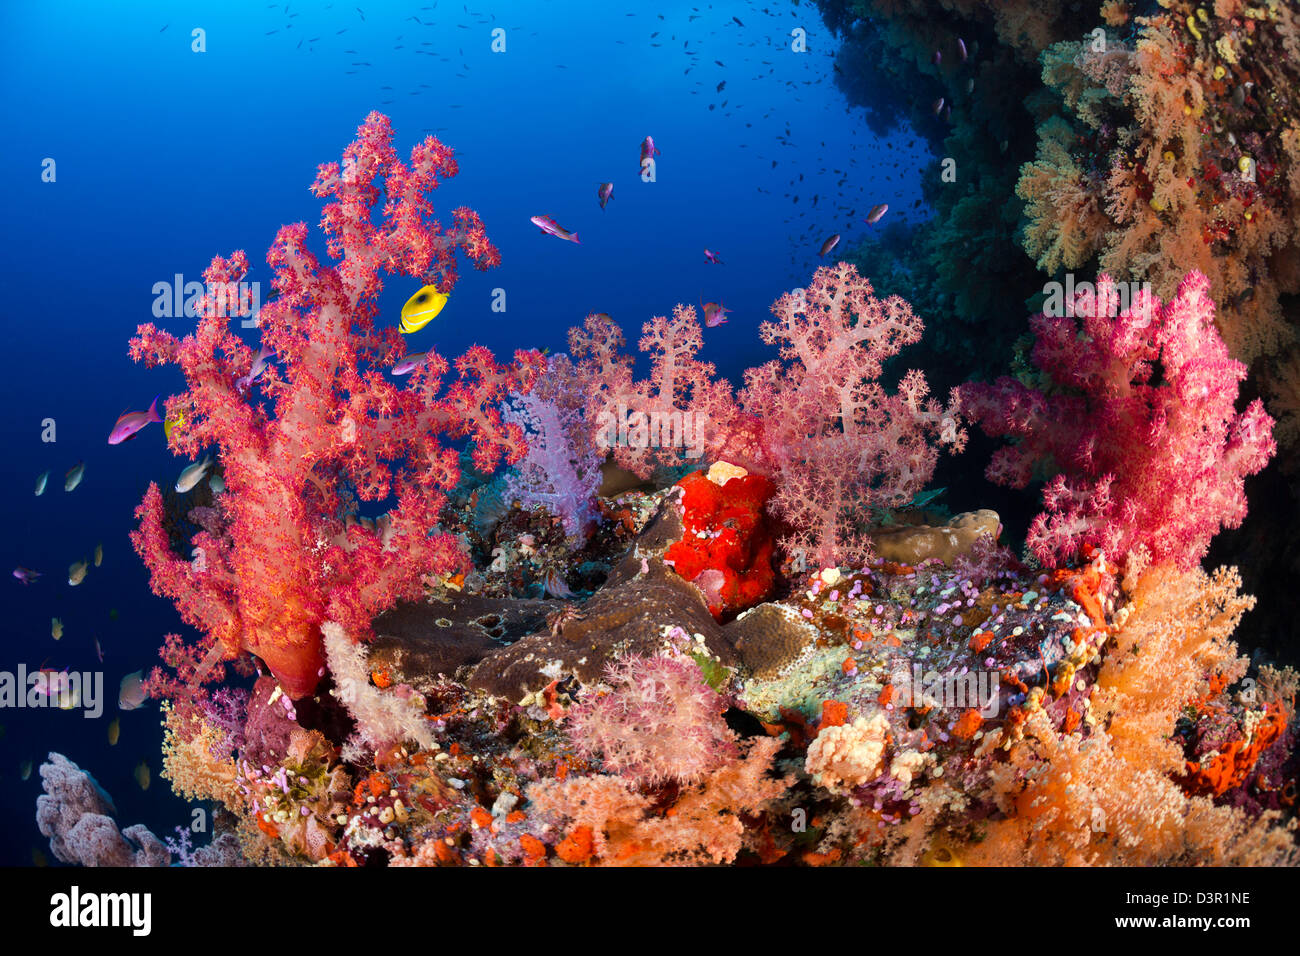 Coral Reef Fish Fiji Stock Photos & Coral Reef Fish Fiji Stock ...